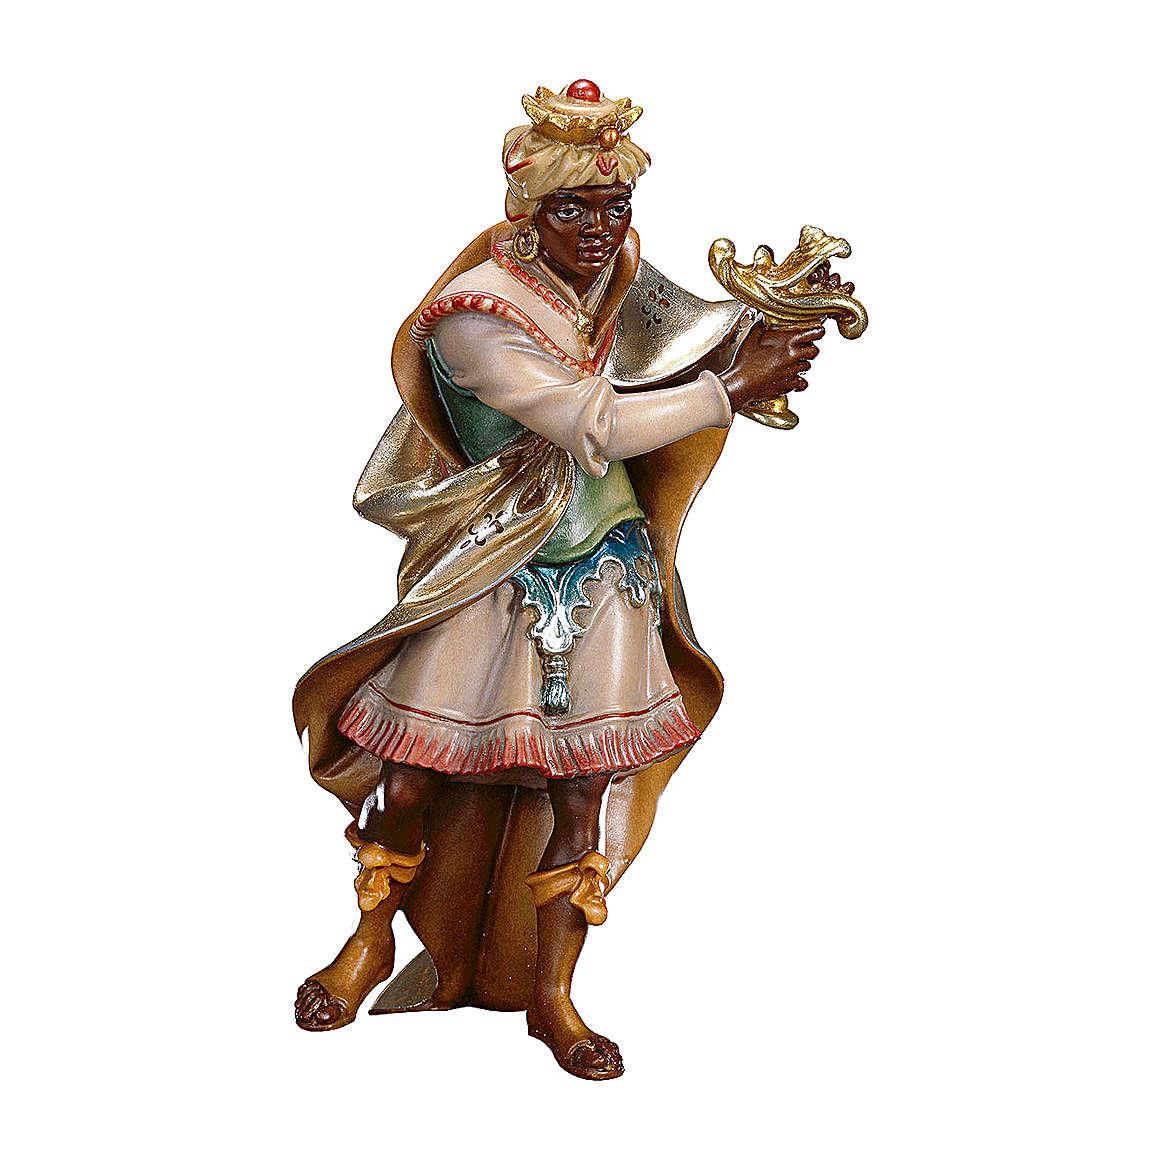 Statuetta Re moro presepe Original legno dipinto Valgardena 12 cm 4